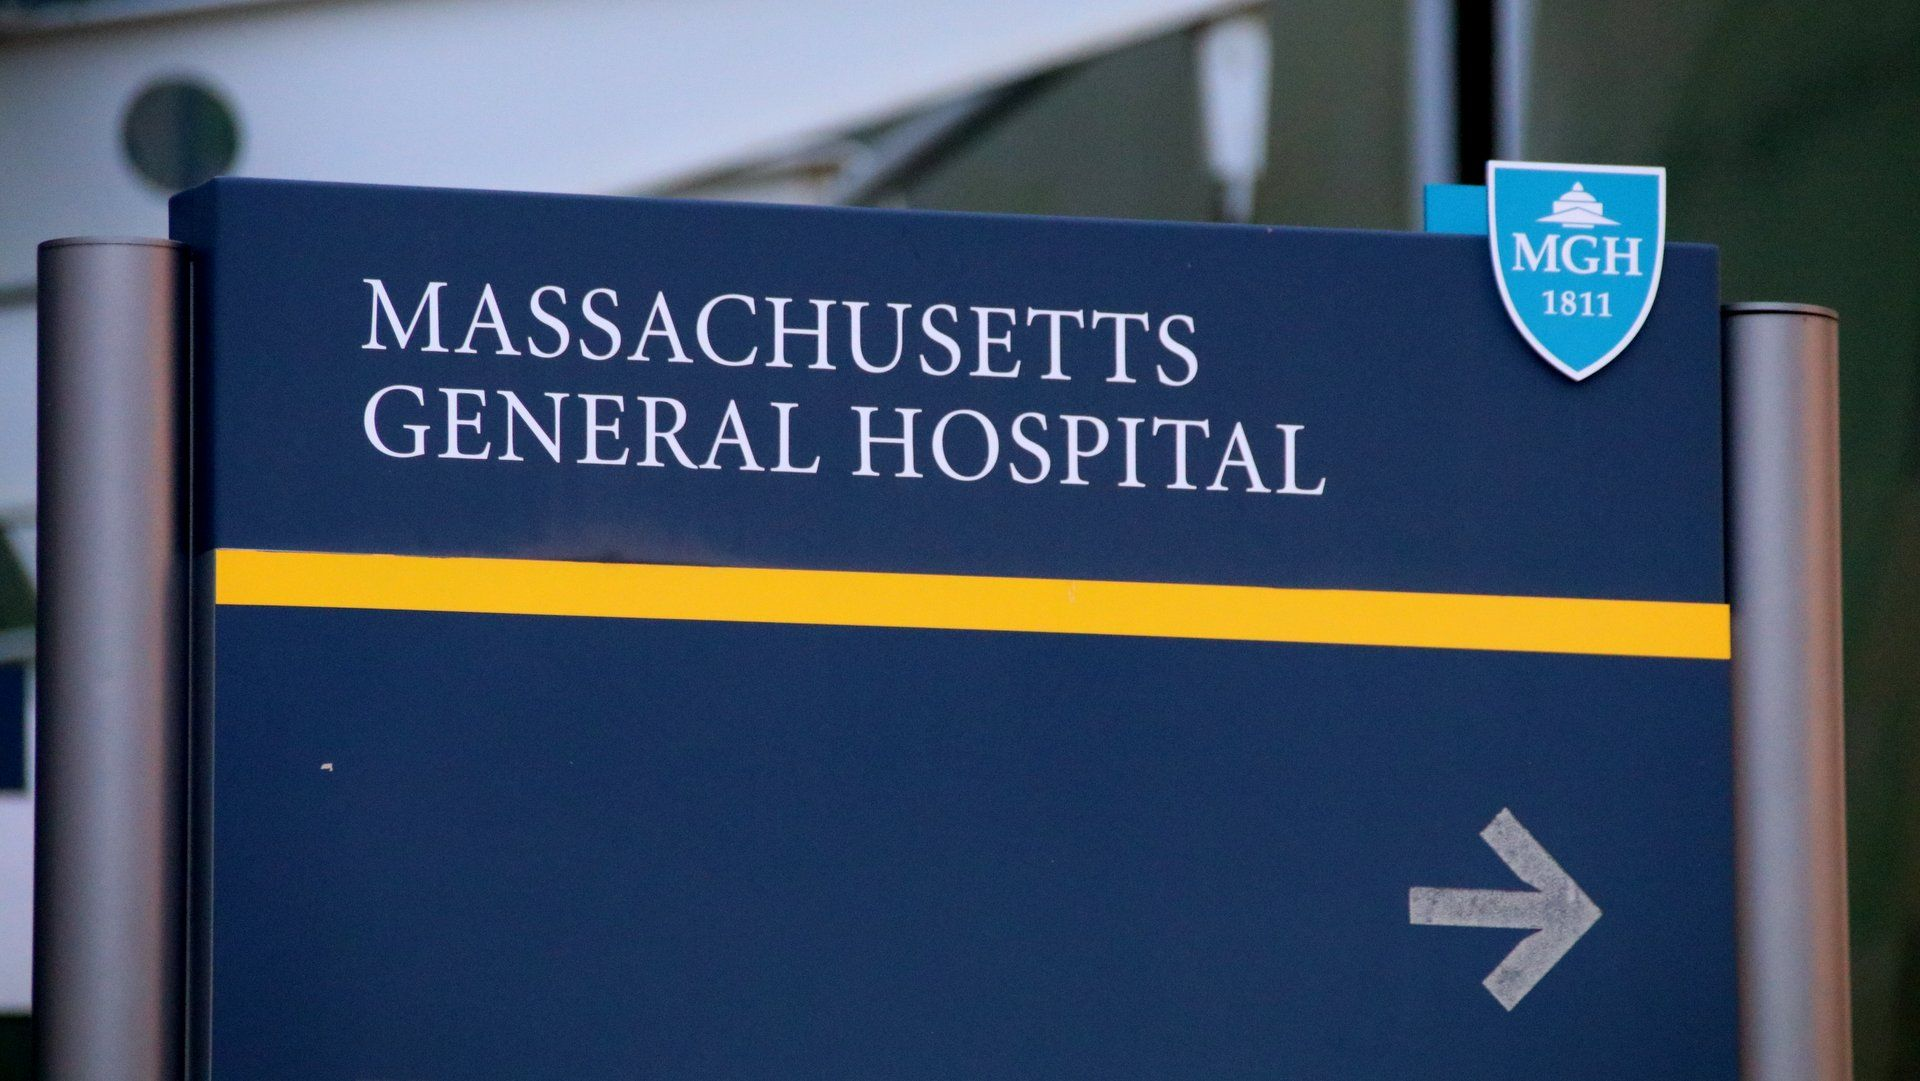 https://www.wcvb.com/article/video-boston-infectious-disease-expert ...